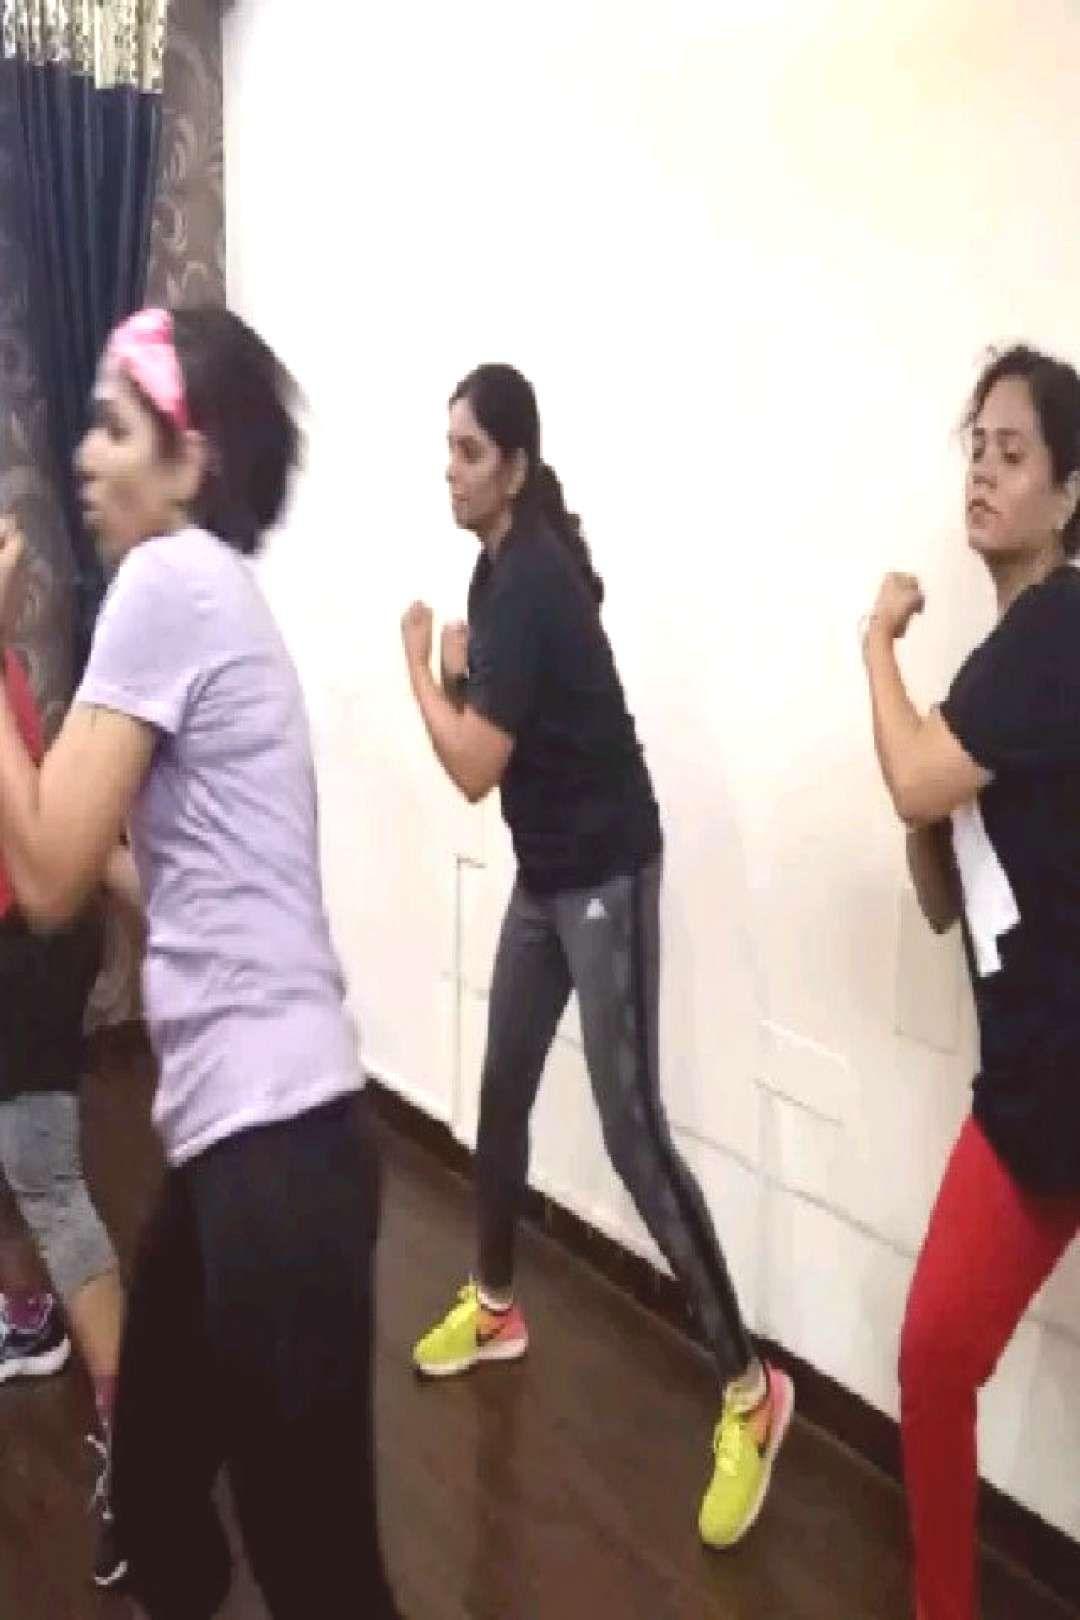 #peaceloveandpositiv #indianwomenfitness #peoplepeople #birthday #standing #fitness #parties #2 FITN...